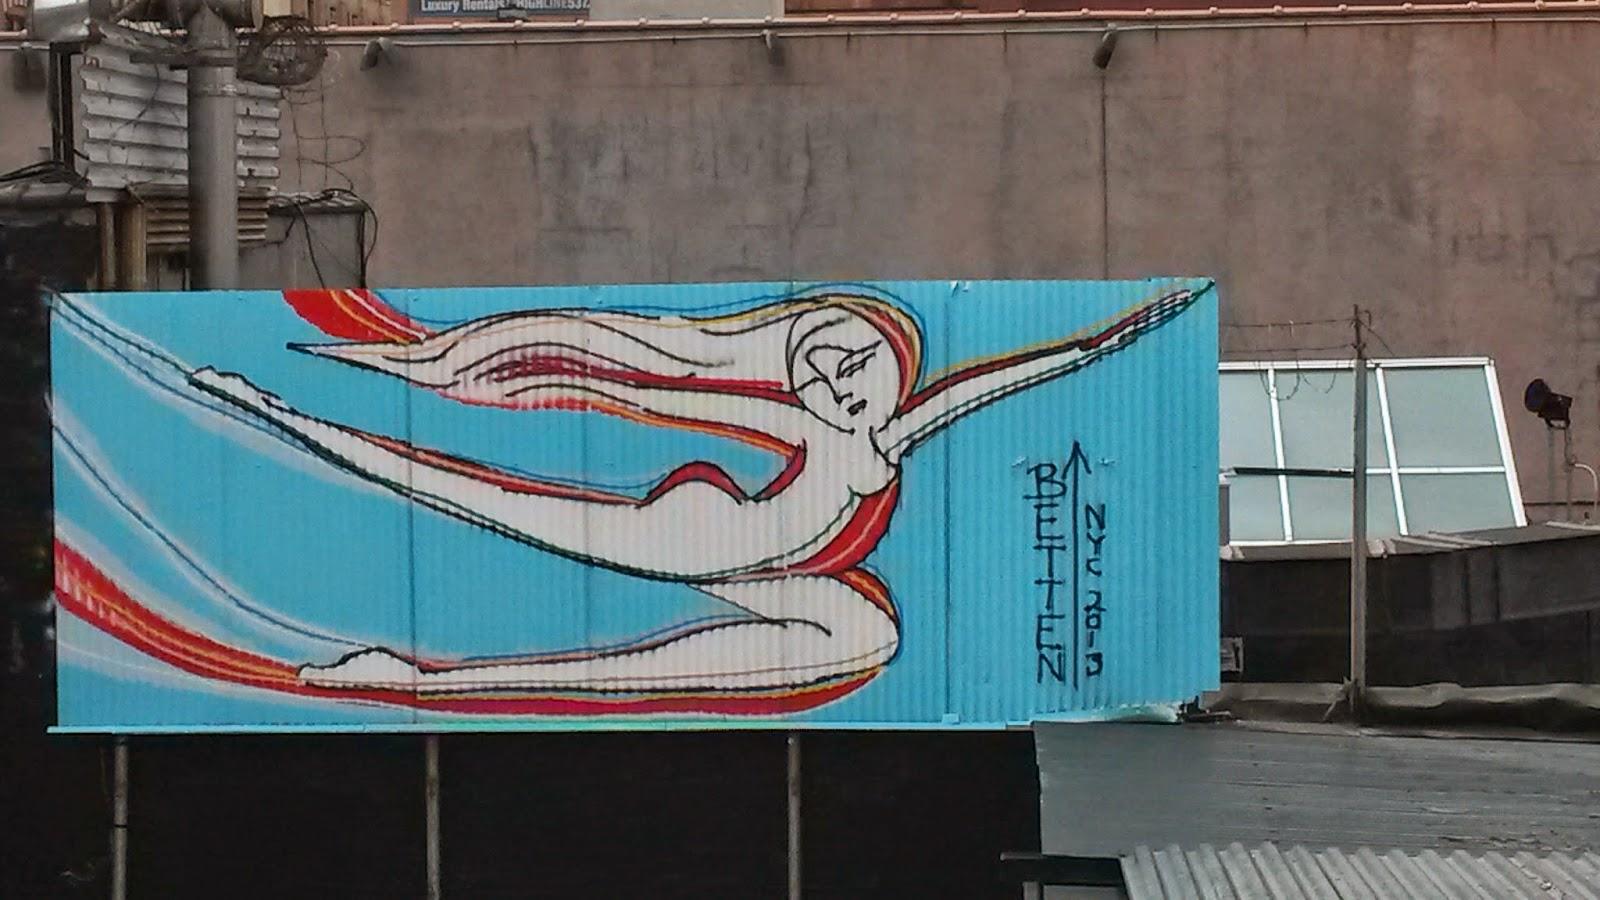 The High Line, Manhattan, New York, Elisa N, Blog de Viajes, Lifestyle, Travel